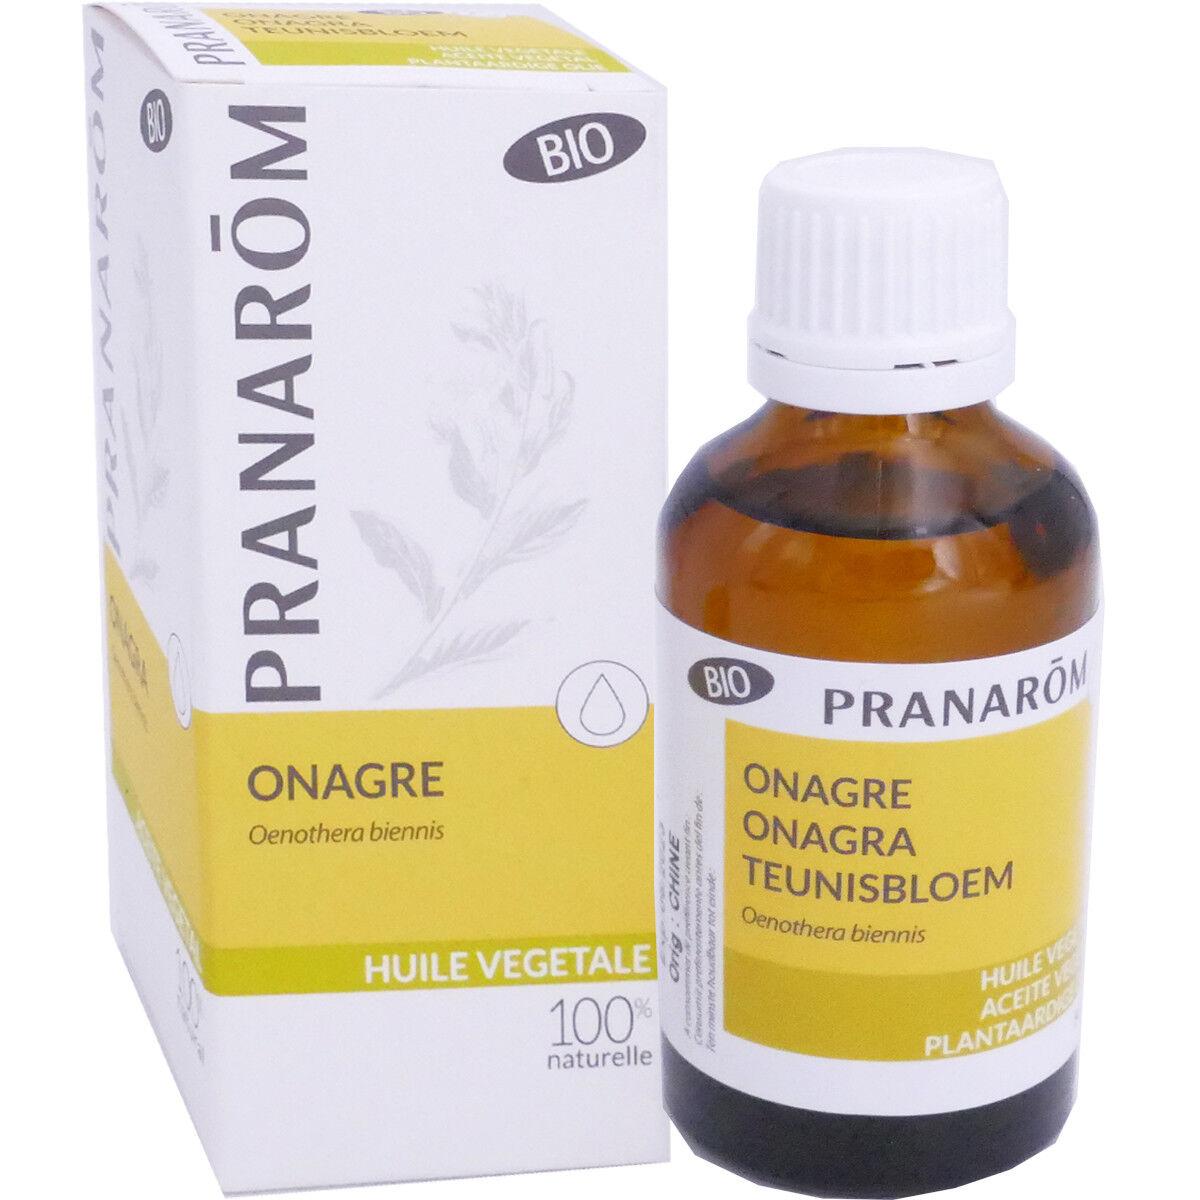 Pranarom huile vegetale bio onagre 50 ml